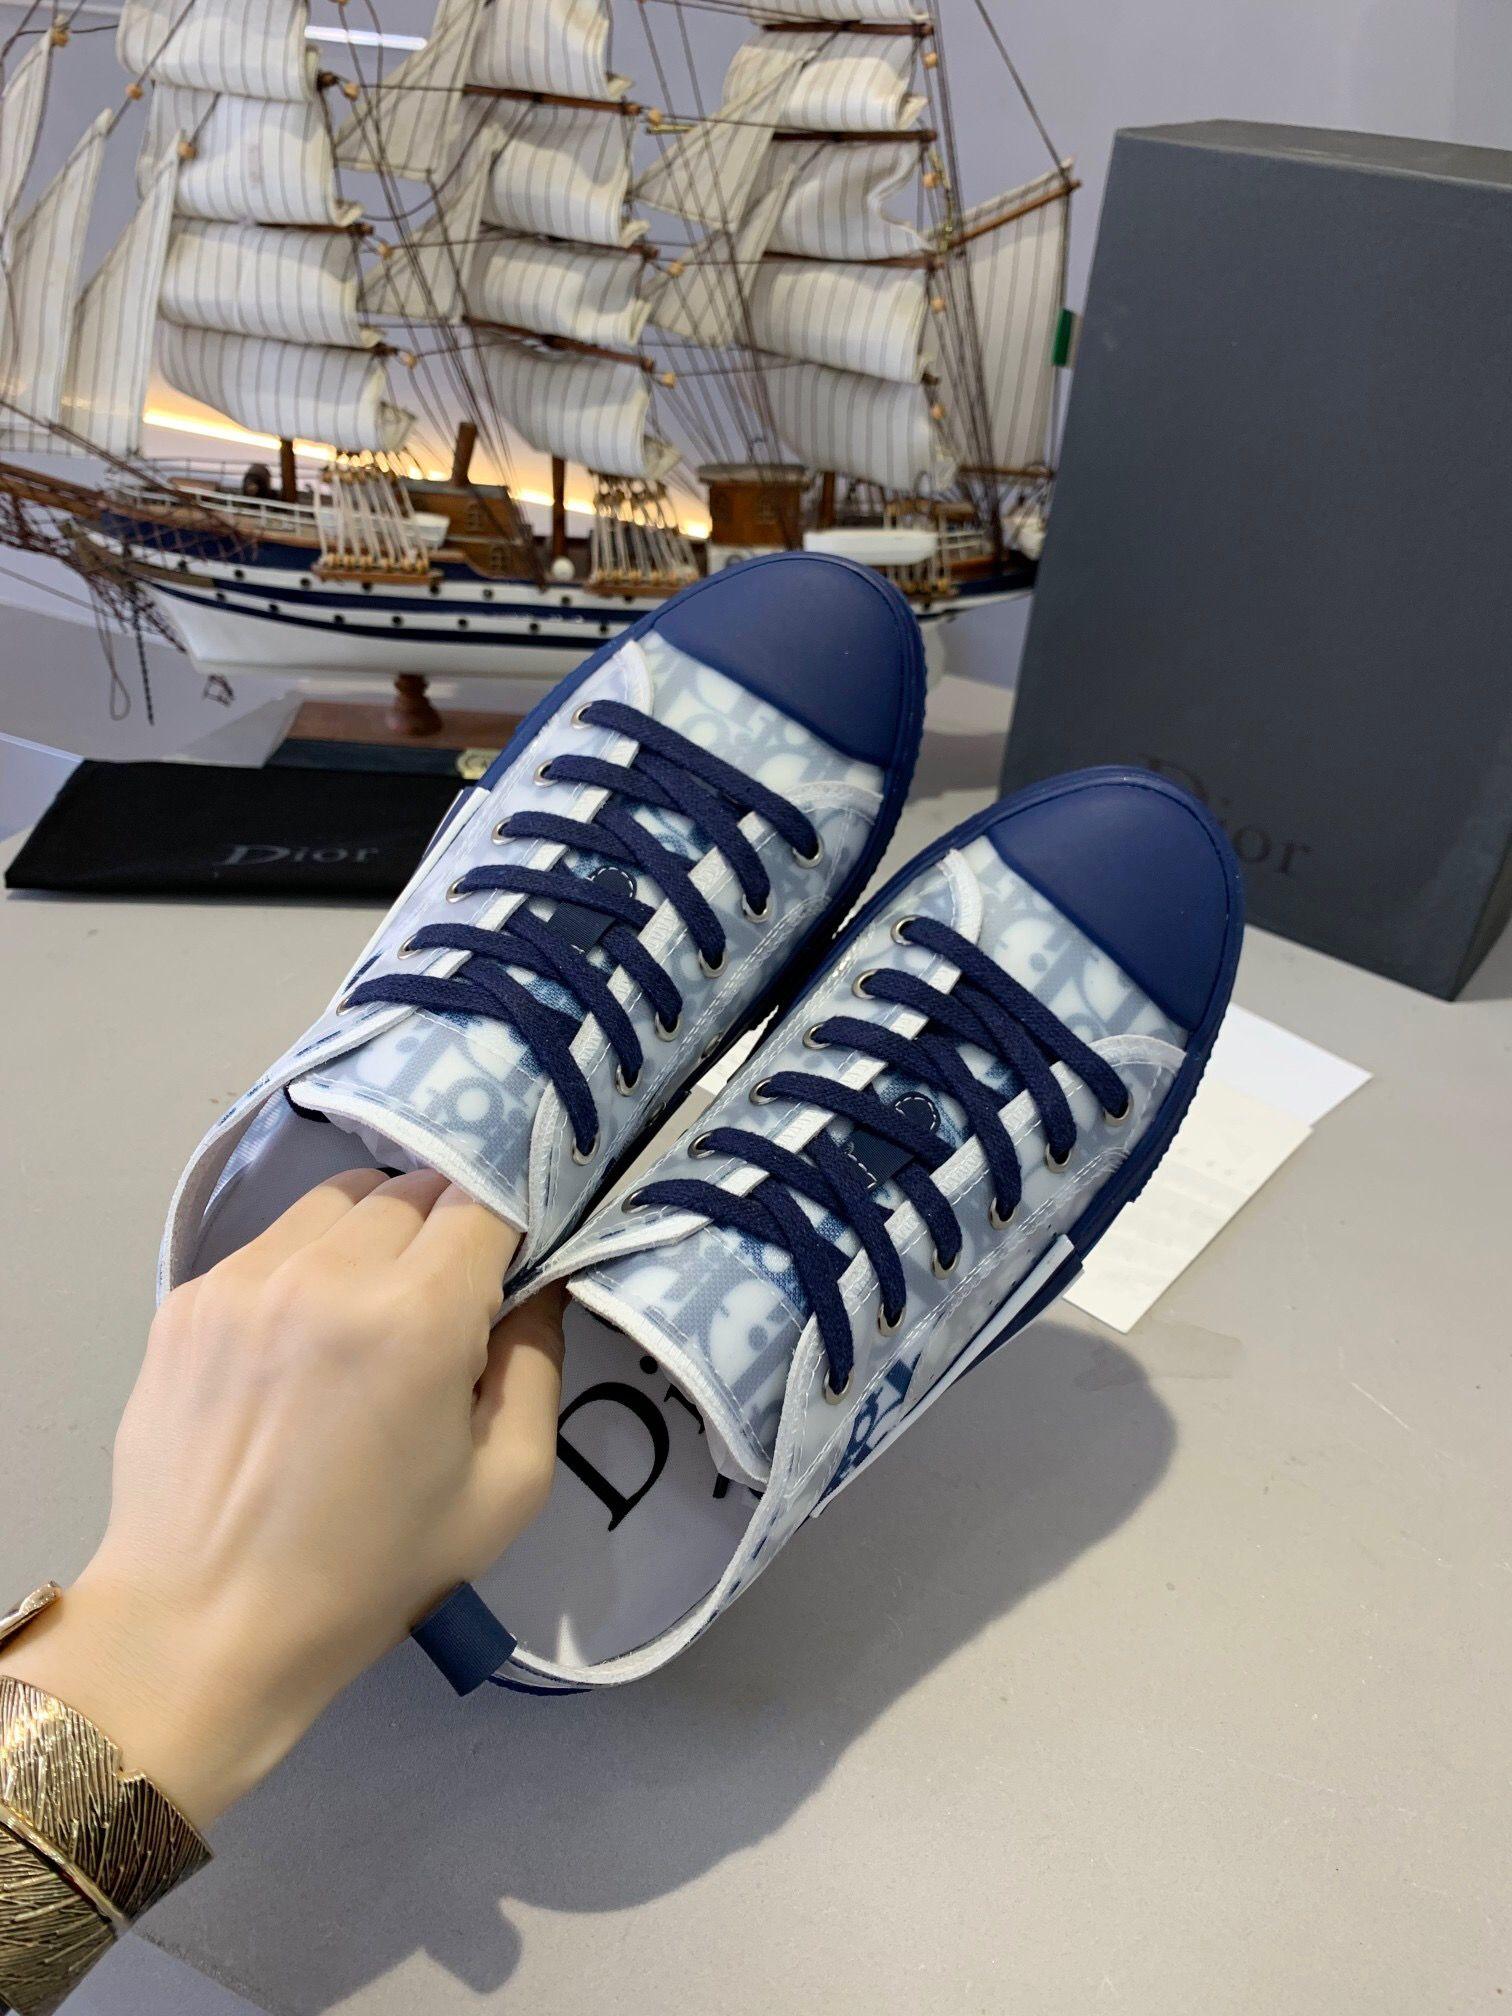 Díor Oblique Homme X KàWS By Kìm Jones Men Women Fashion Designres Triple S Luxury Casual Shoes High Top Sneakers Skateboard Shoes Boots A5